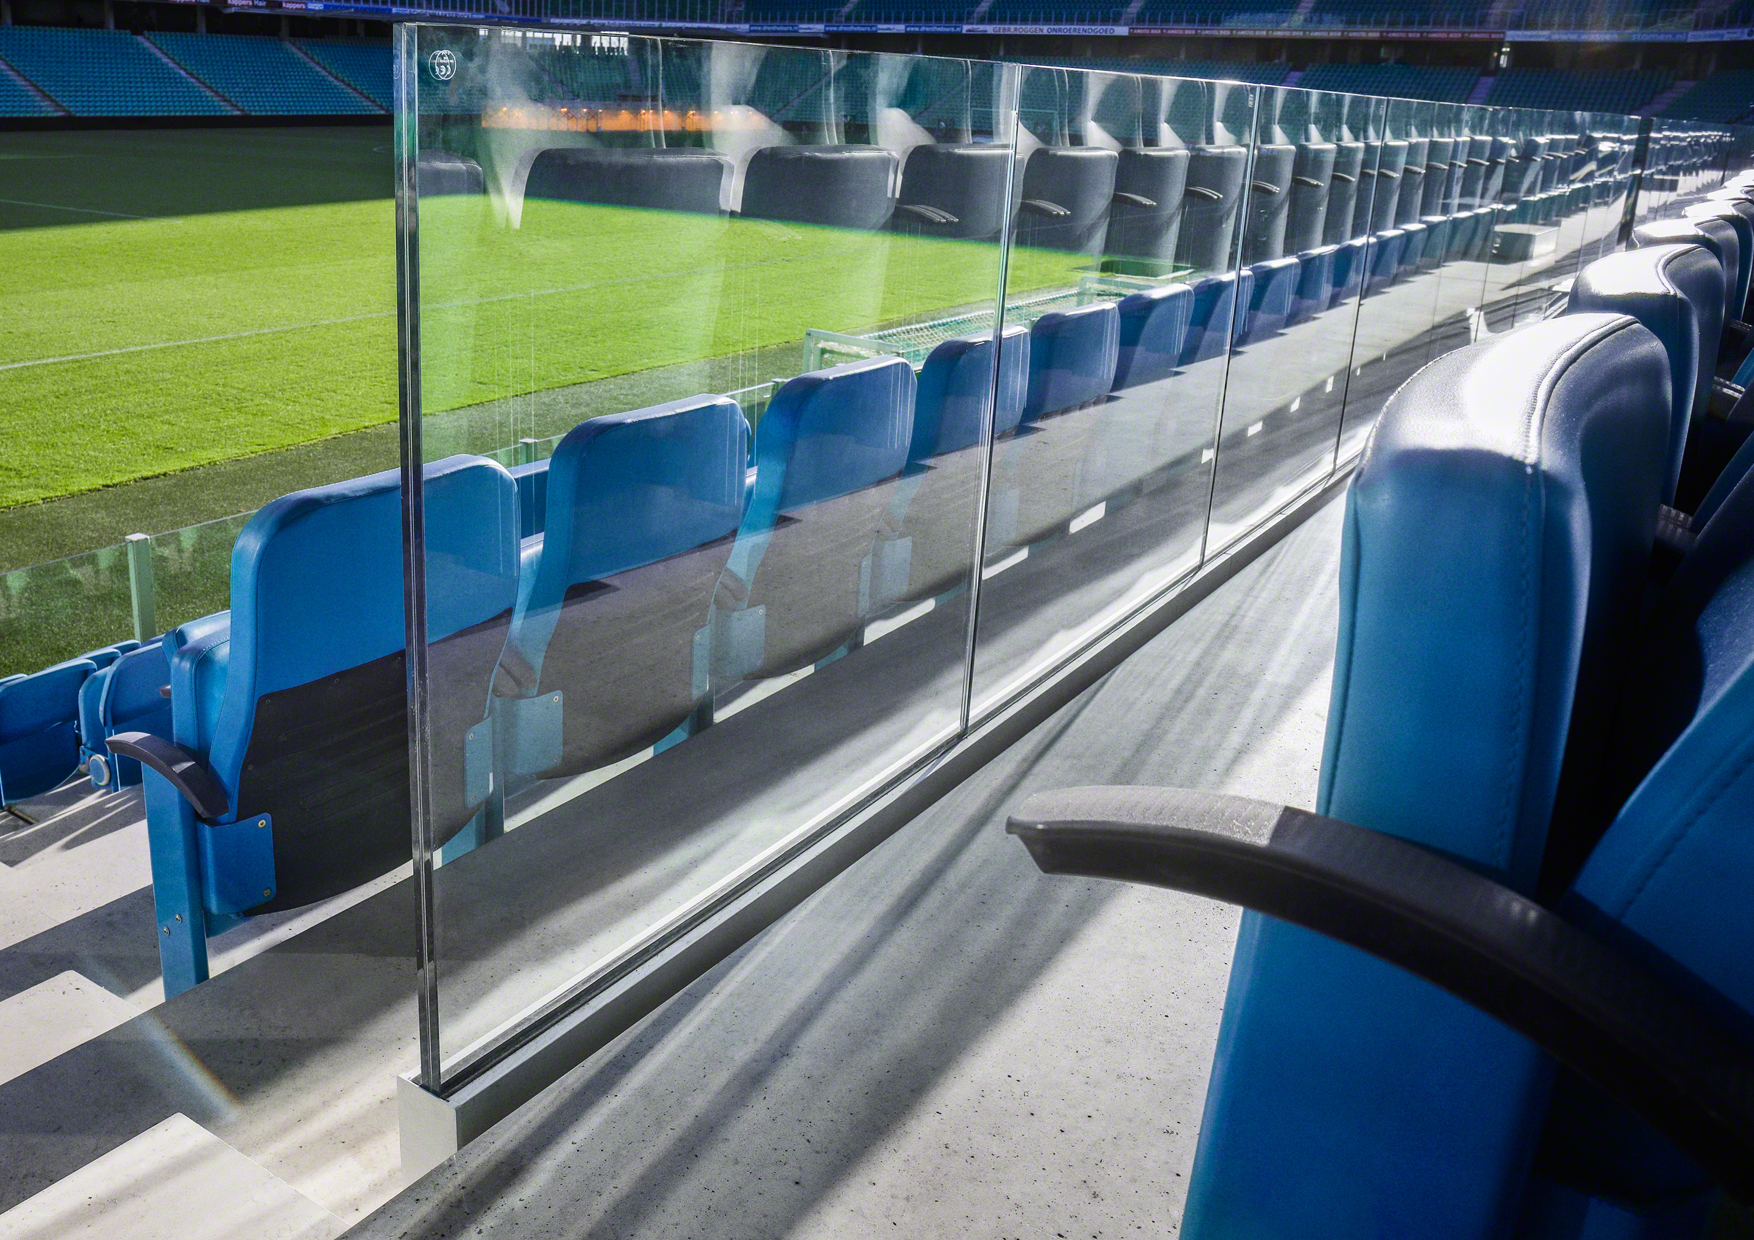 q railing introduceert sterkste glasrailingsysteem aller tijden glas in beeld. Black Bedroom Furniture Sets. Home Design Ideas